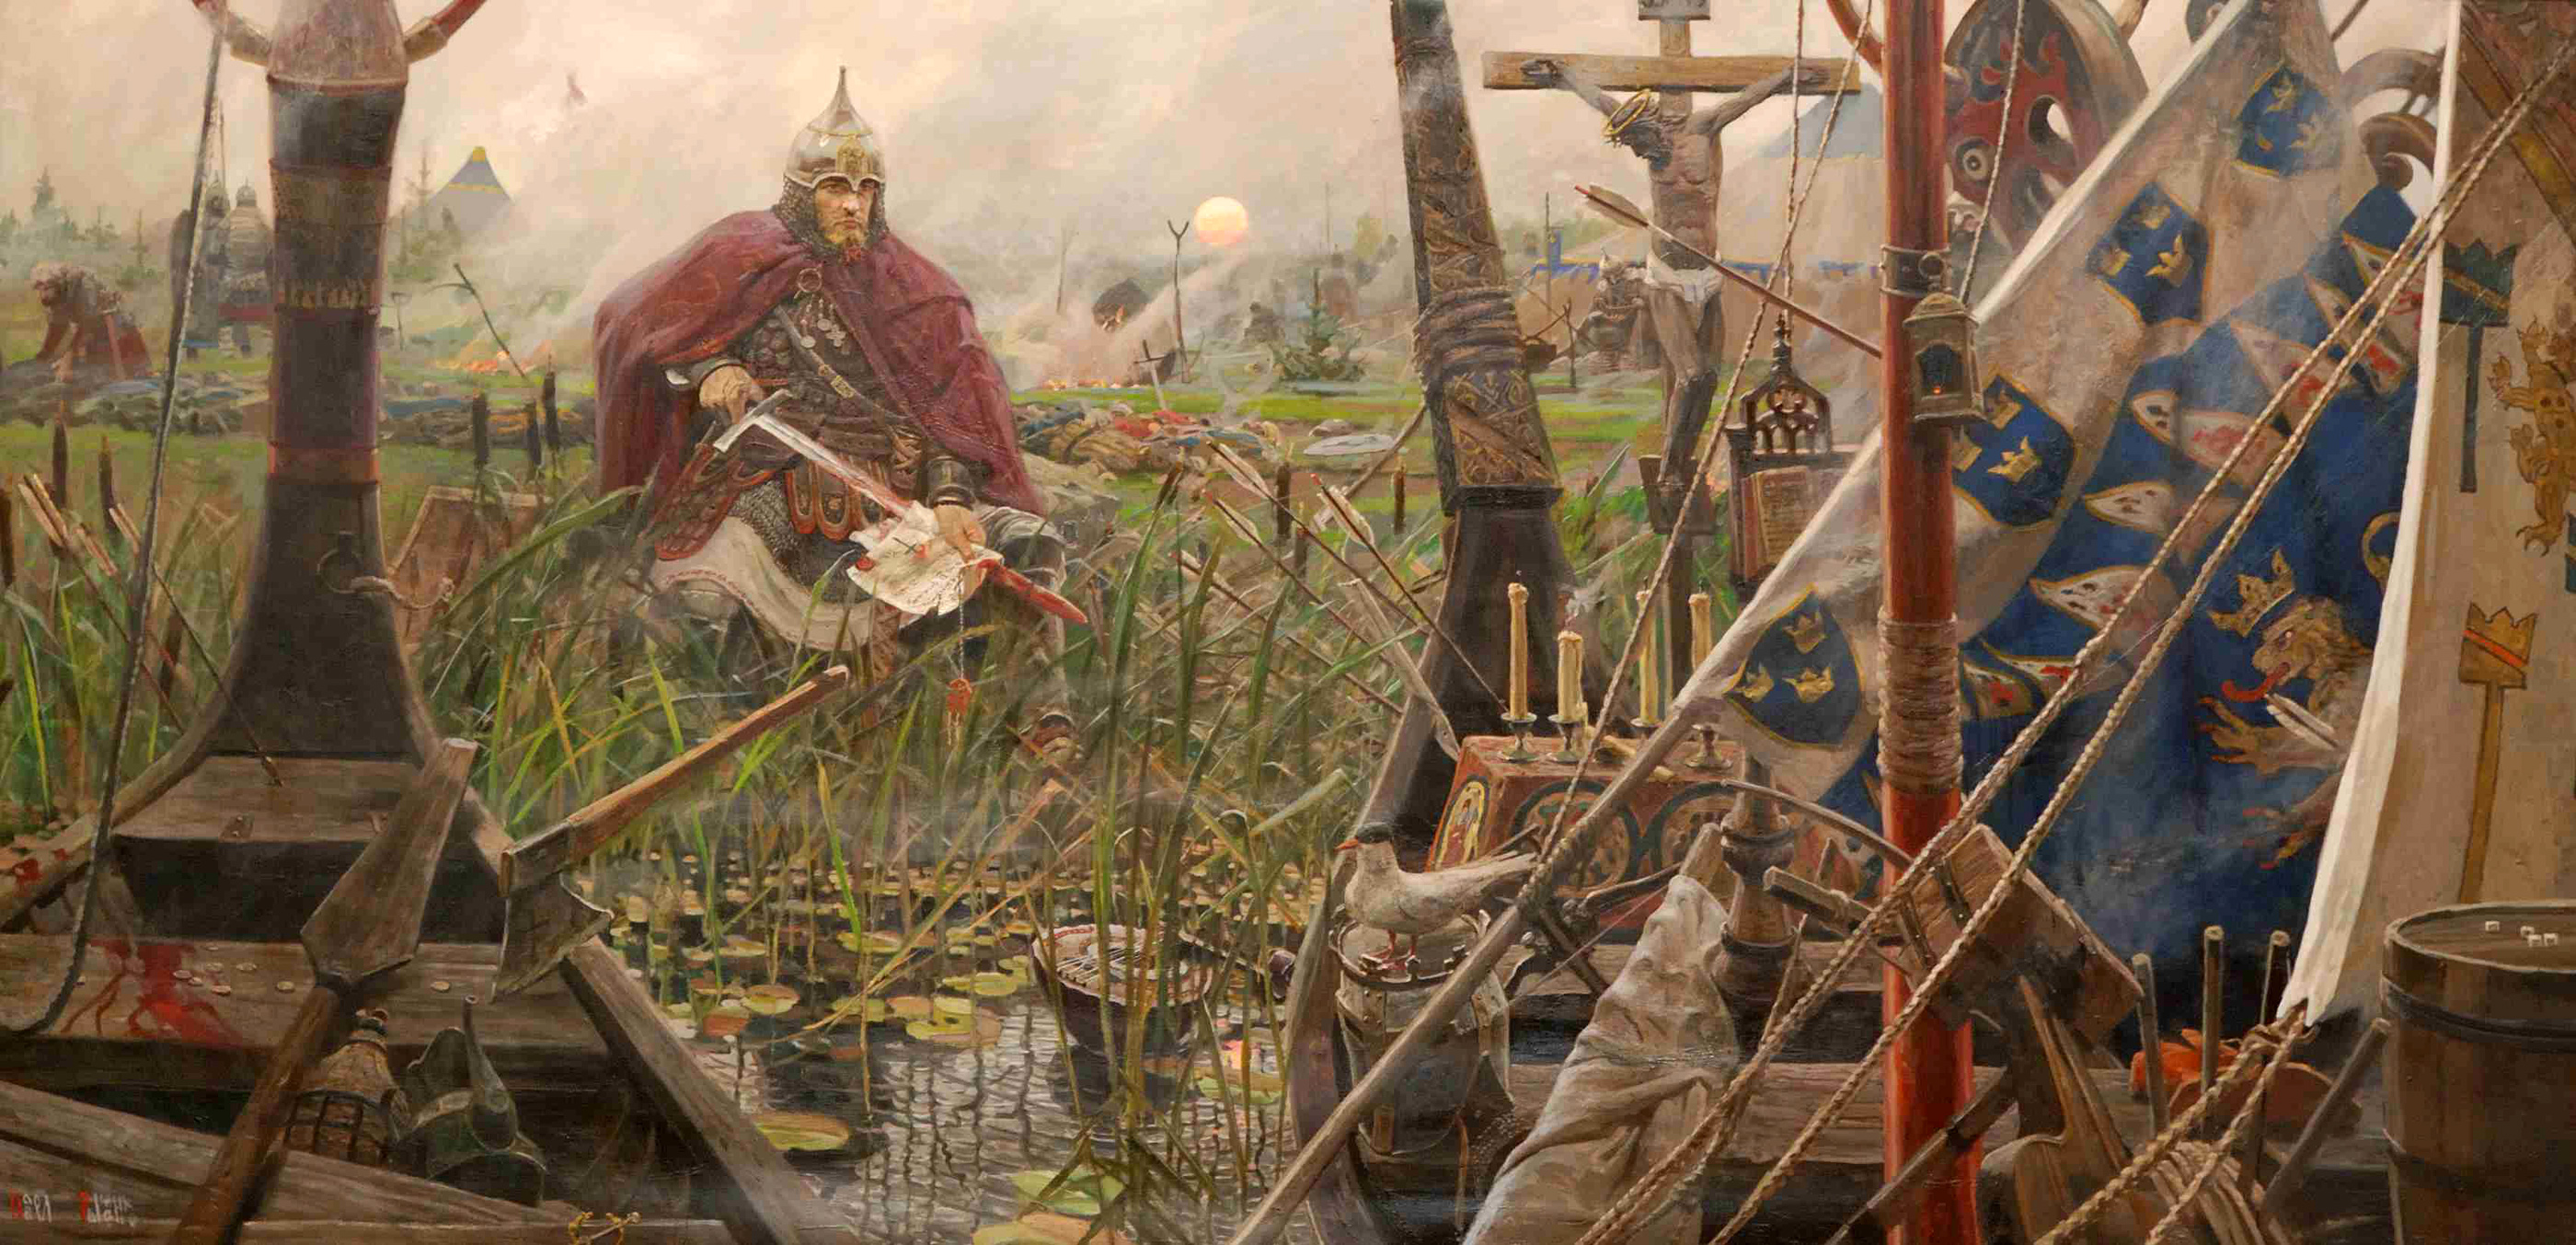 Когда должно быть стыдно... Ryzhenkov_pavel_viktorovich_17_triptych_the_sun_of_the_russian_land_battle_of_the_neva_2008_2009